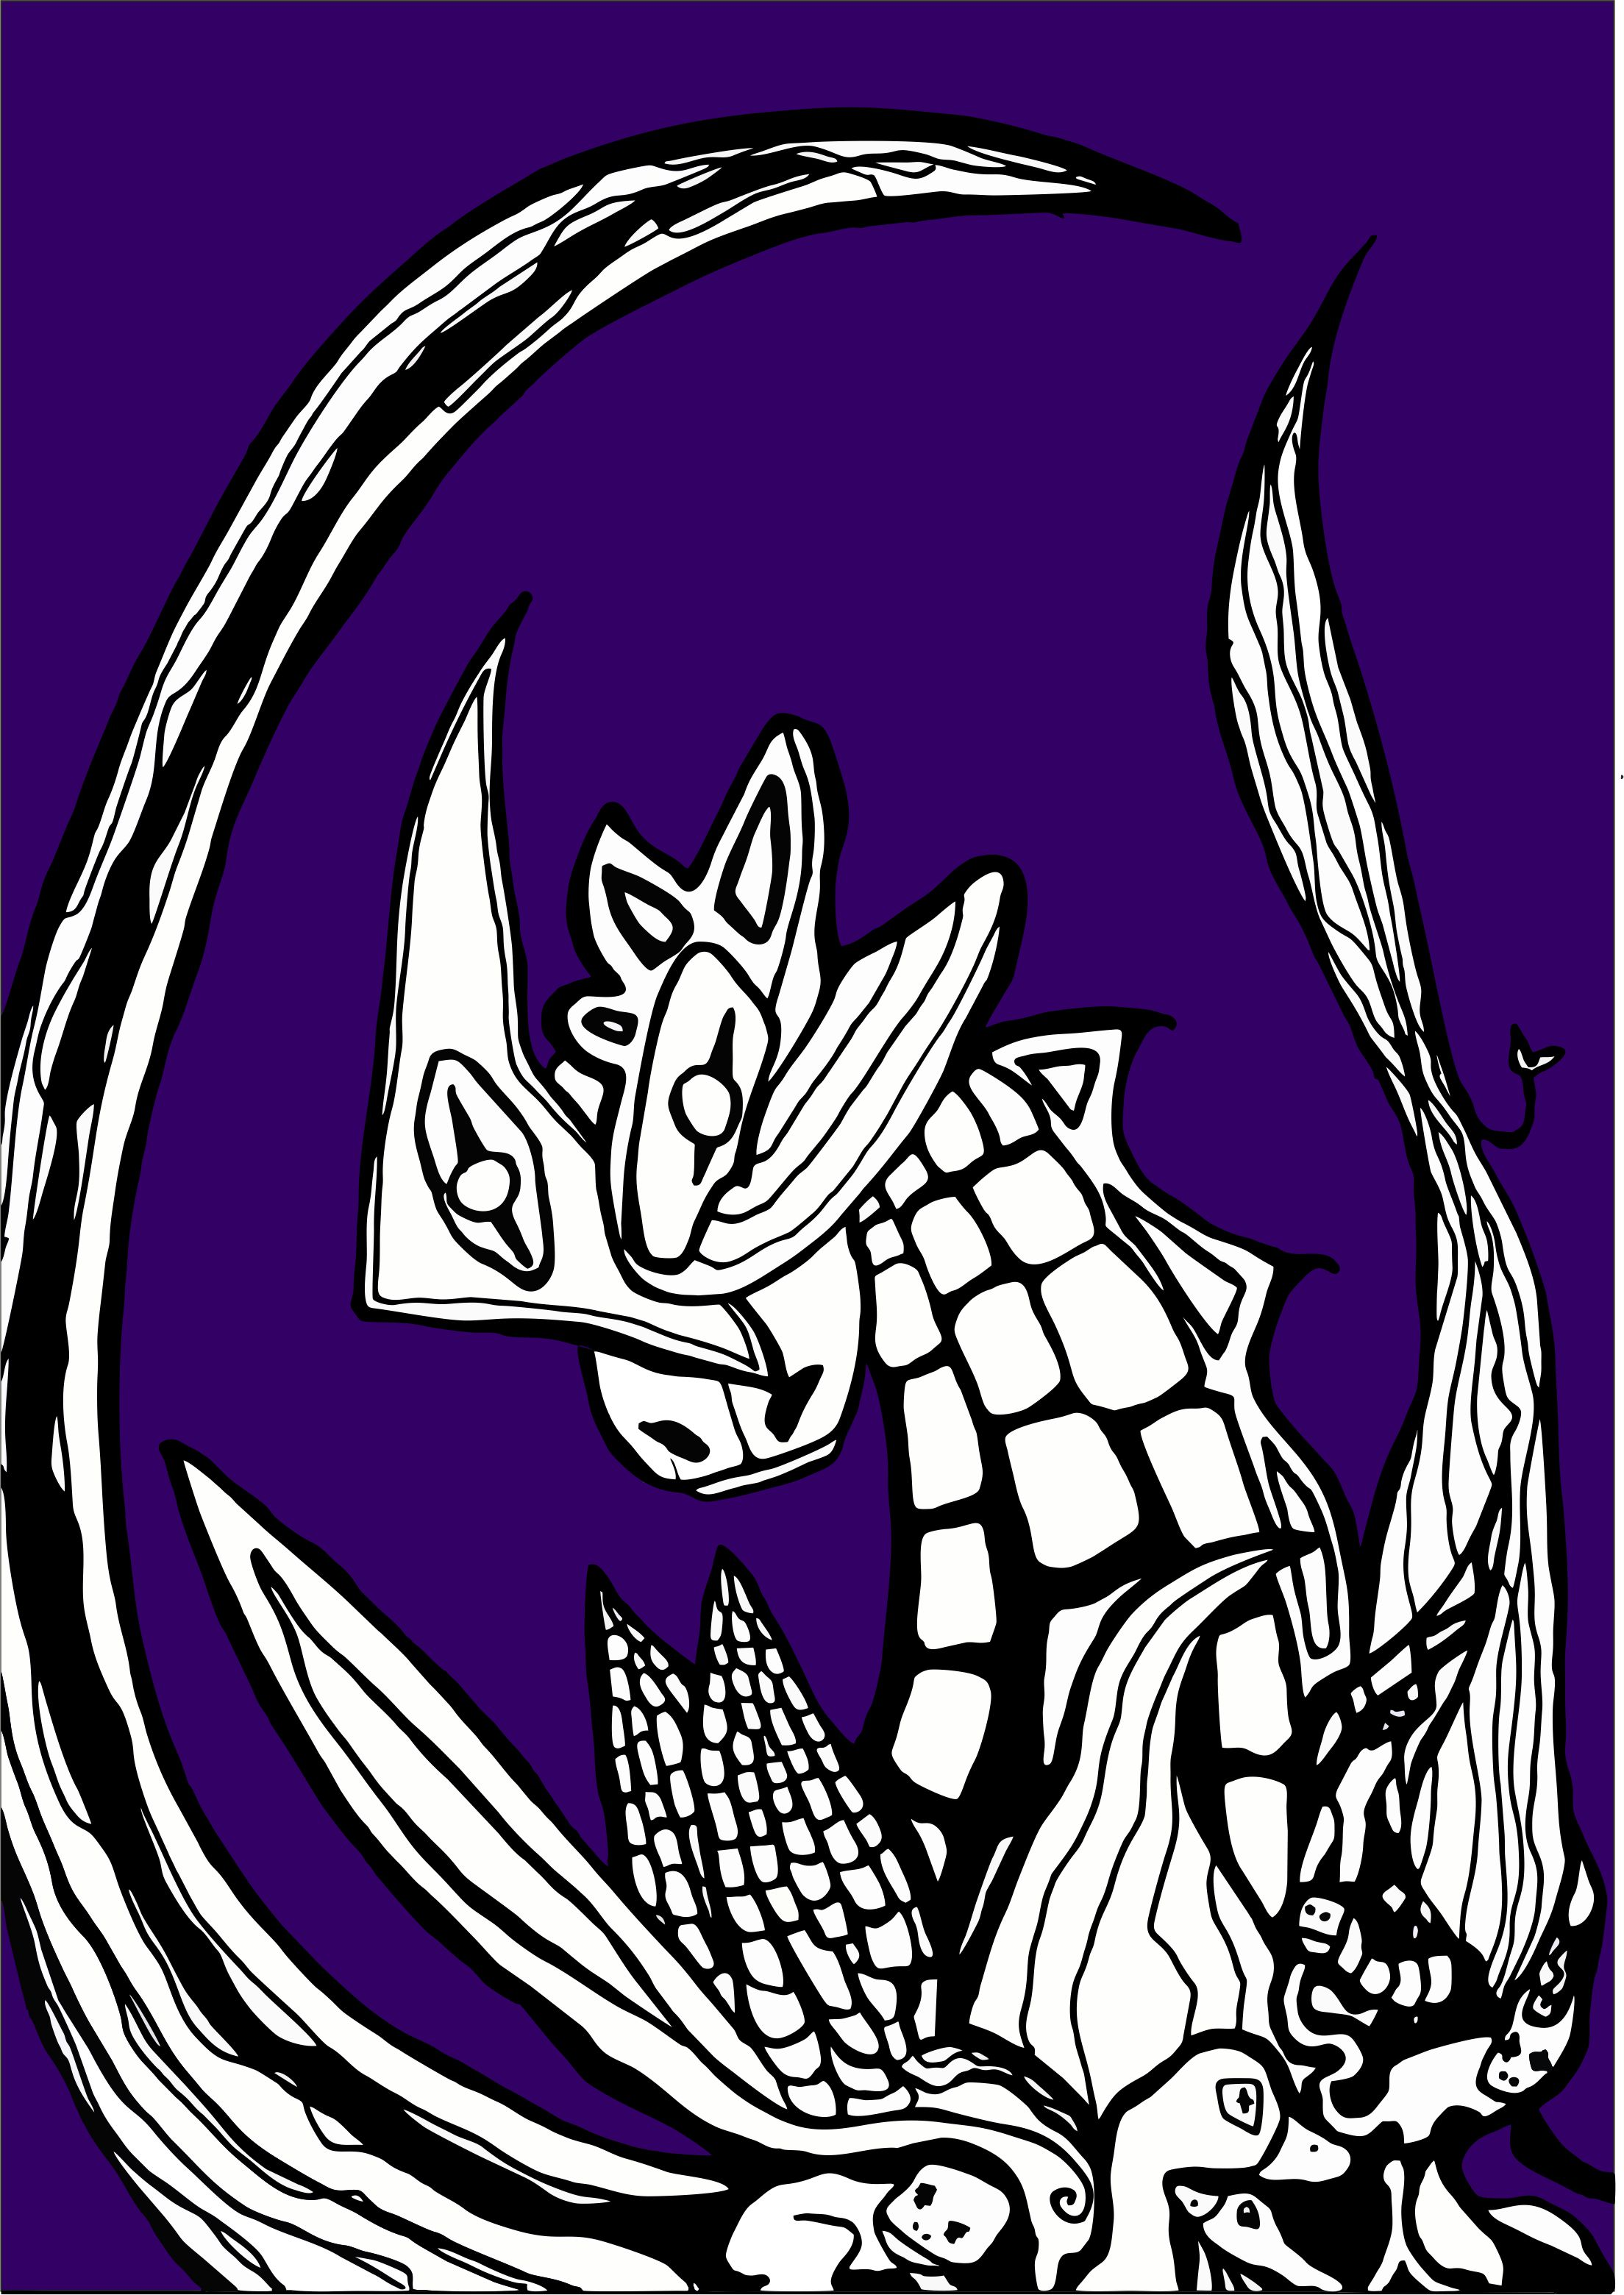 dragon-abstract-art.jpg